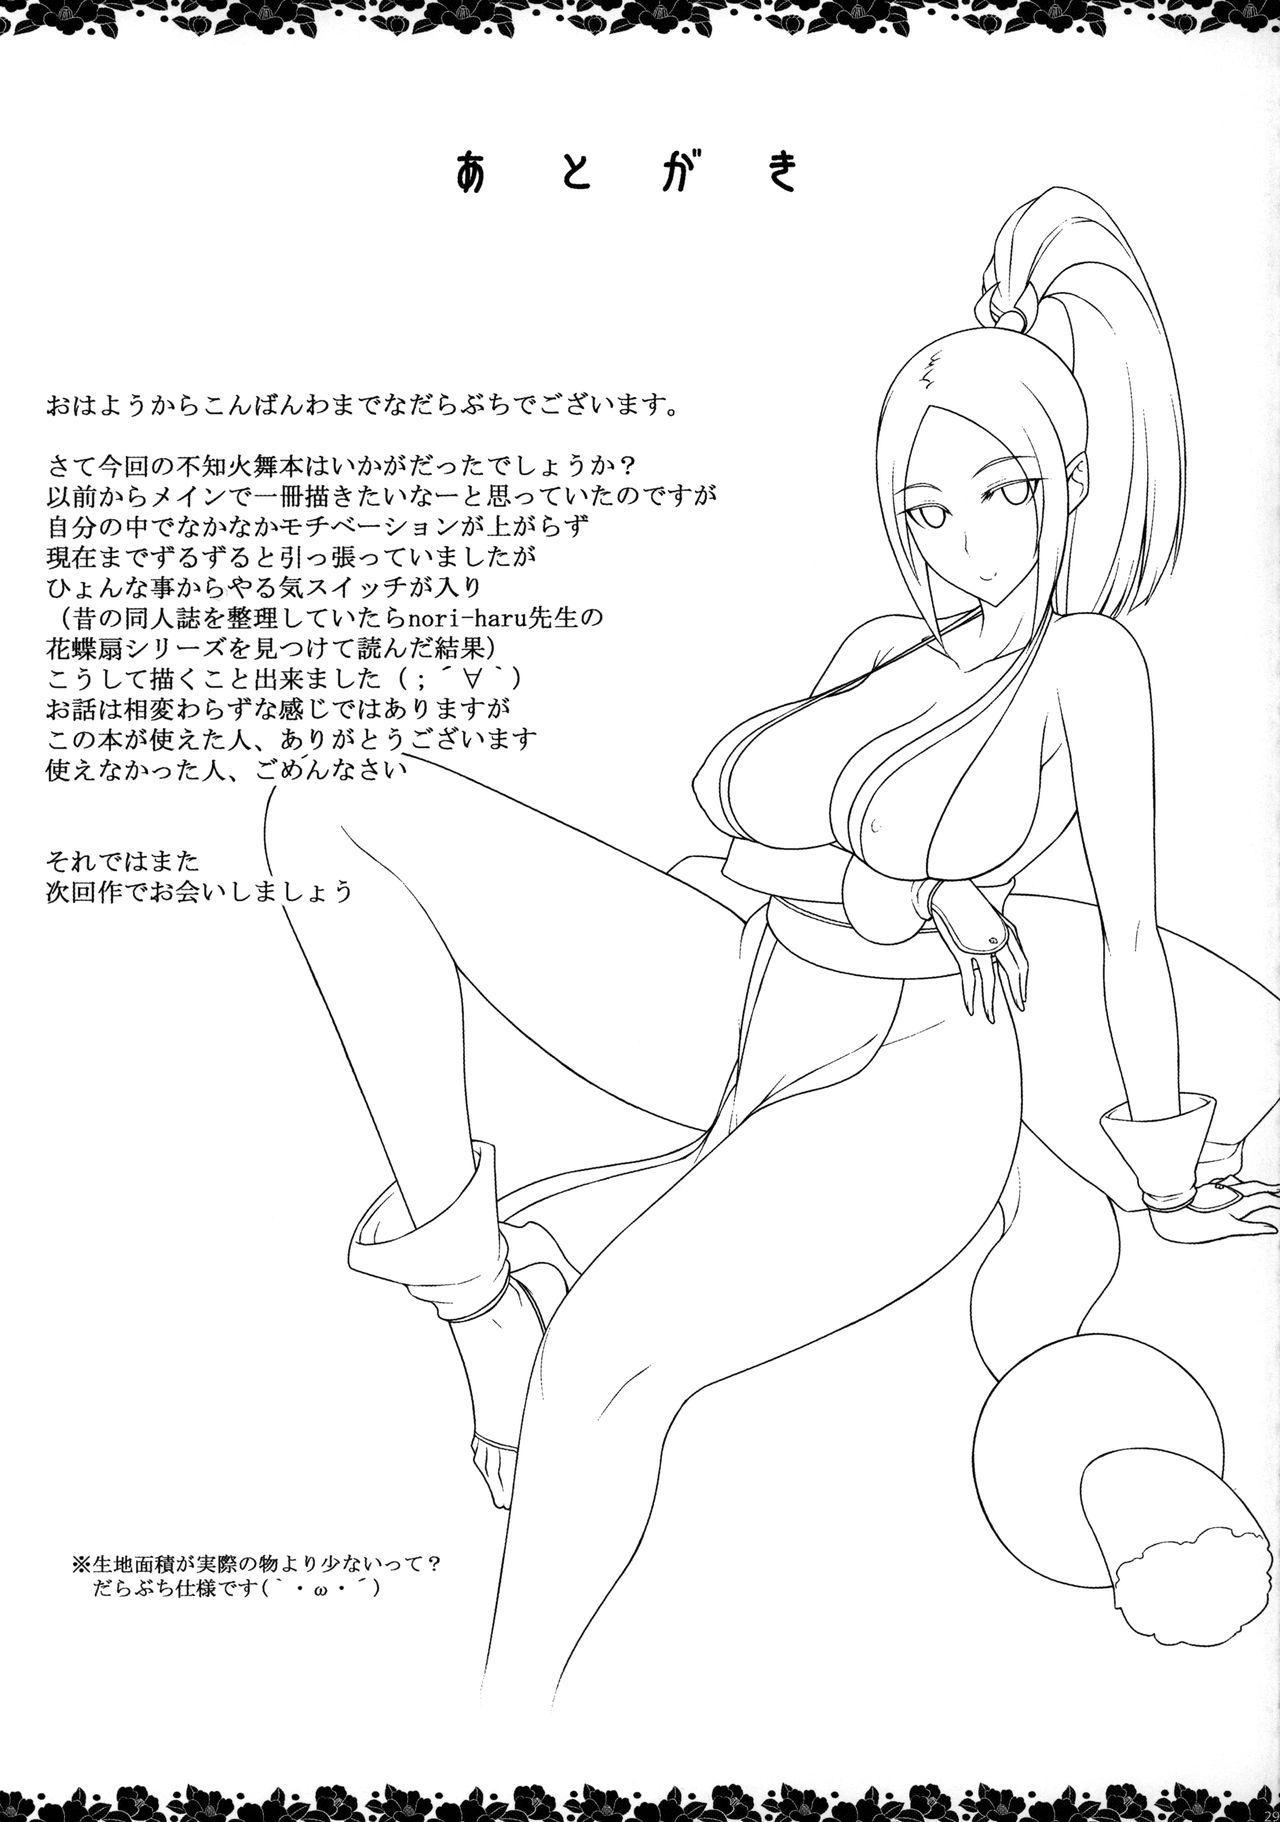 Daraku no hana   Flower of depravity 27